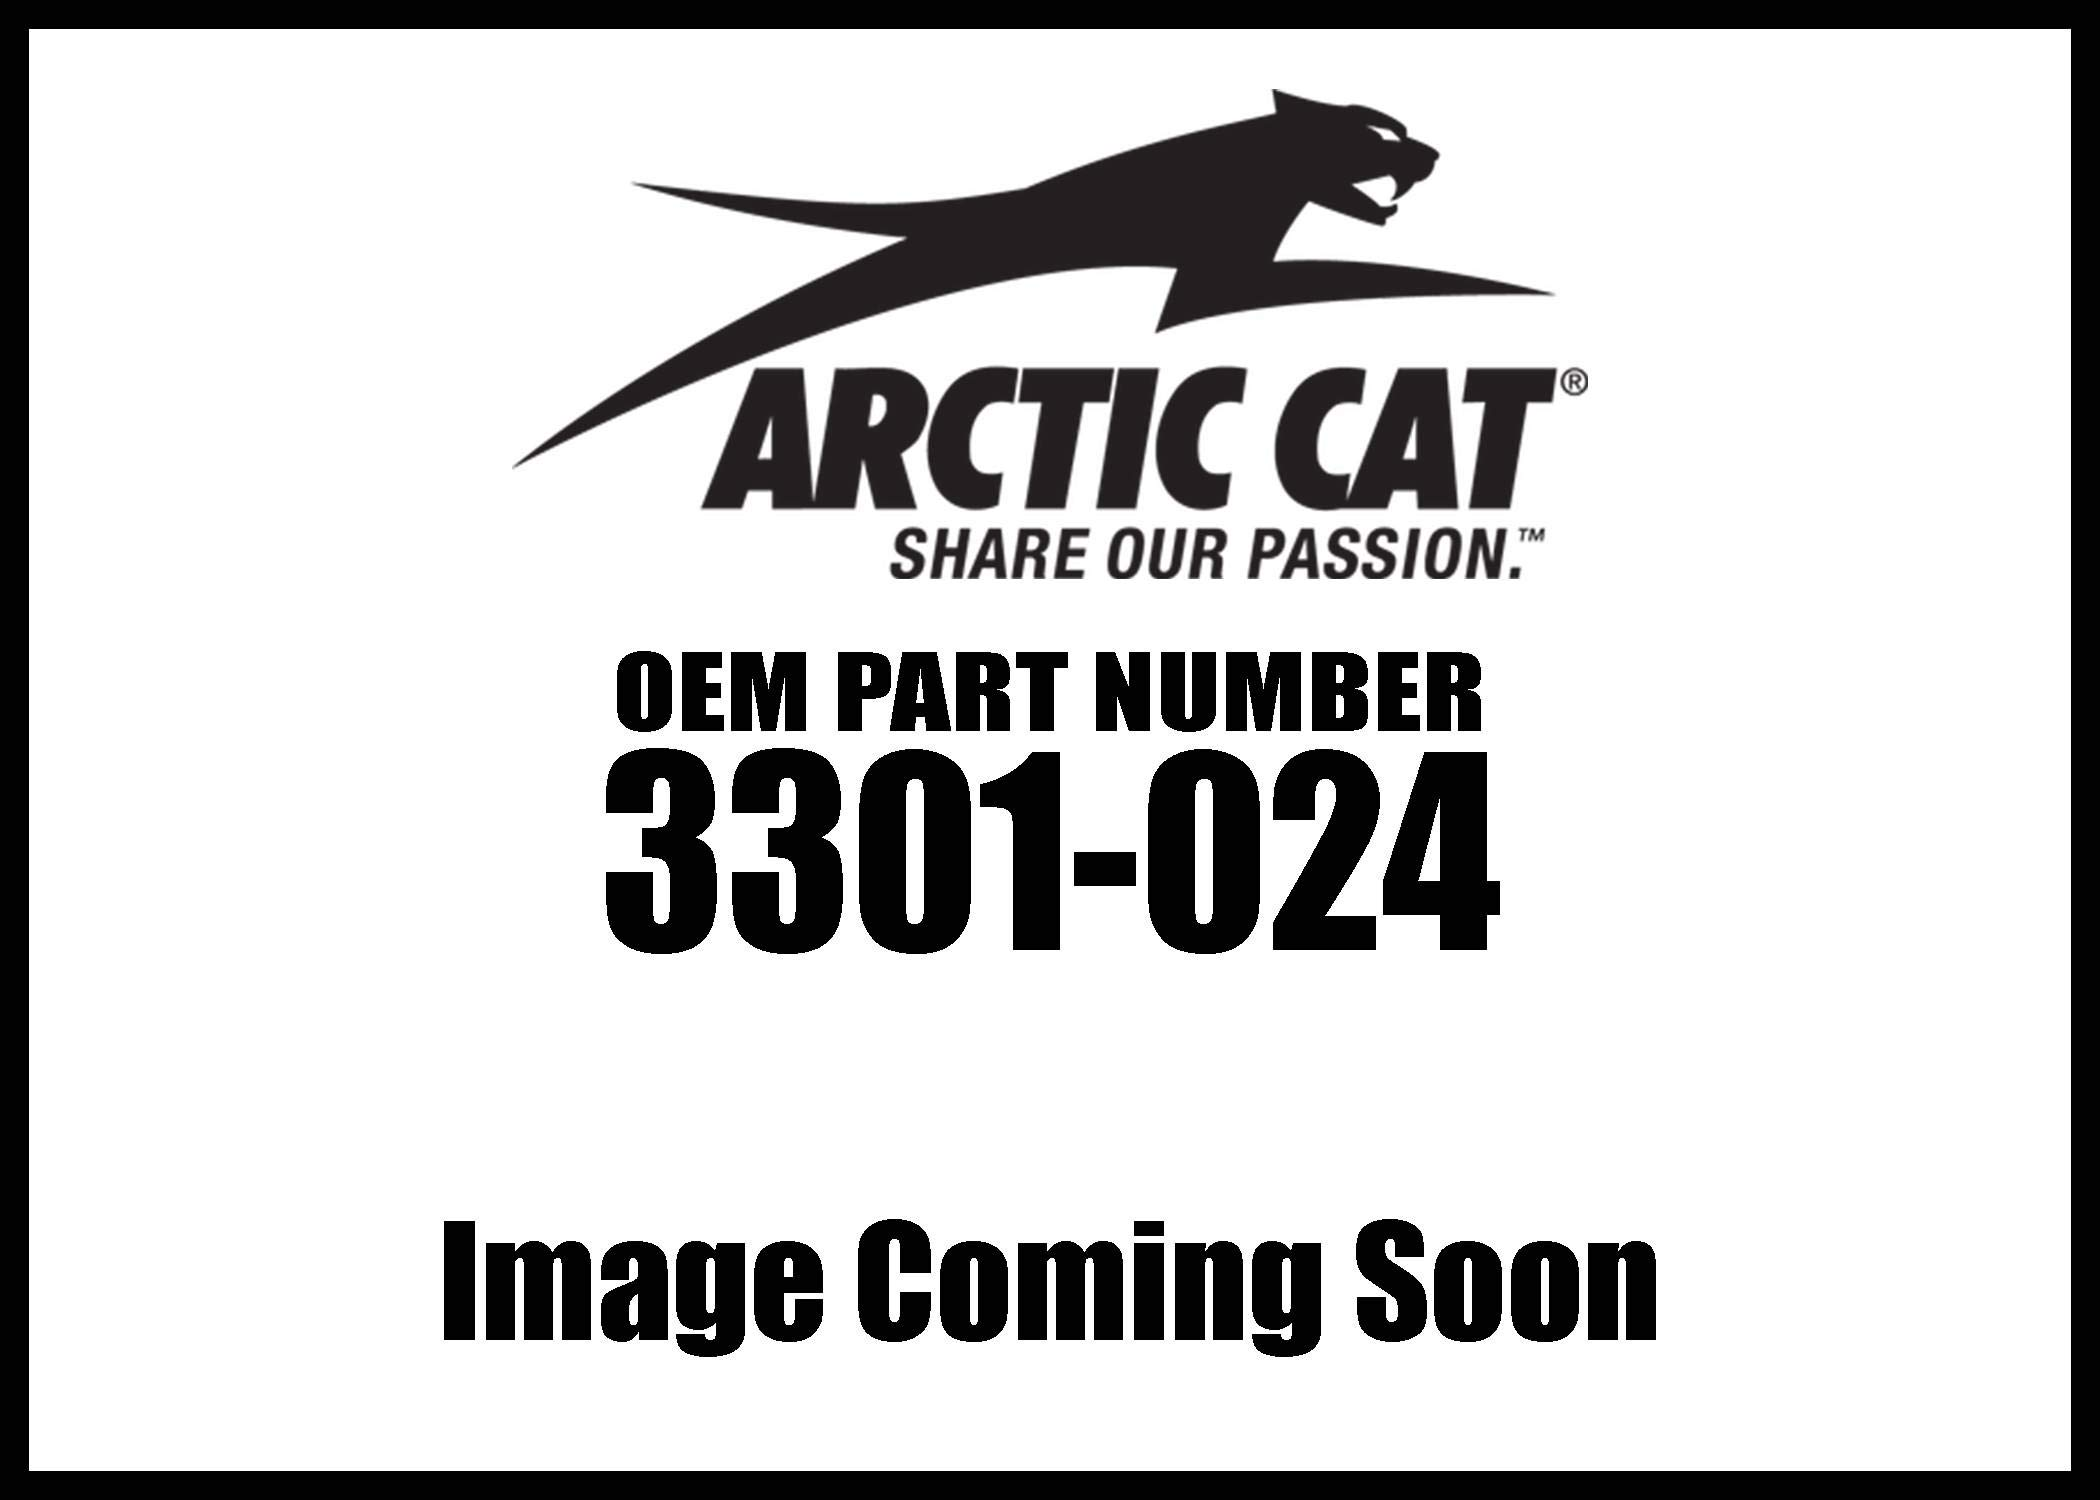 Arctic Cat 2003-2005 Atv 90 Y-12 Youth Clip Piston Pin 3301-024 New Oem